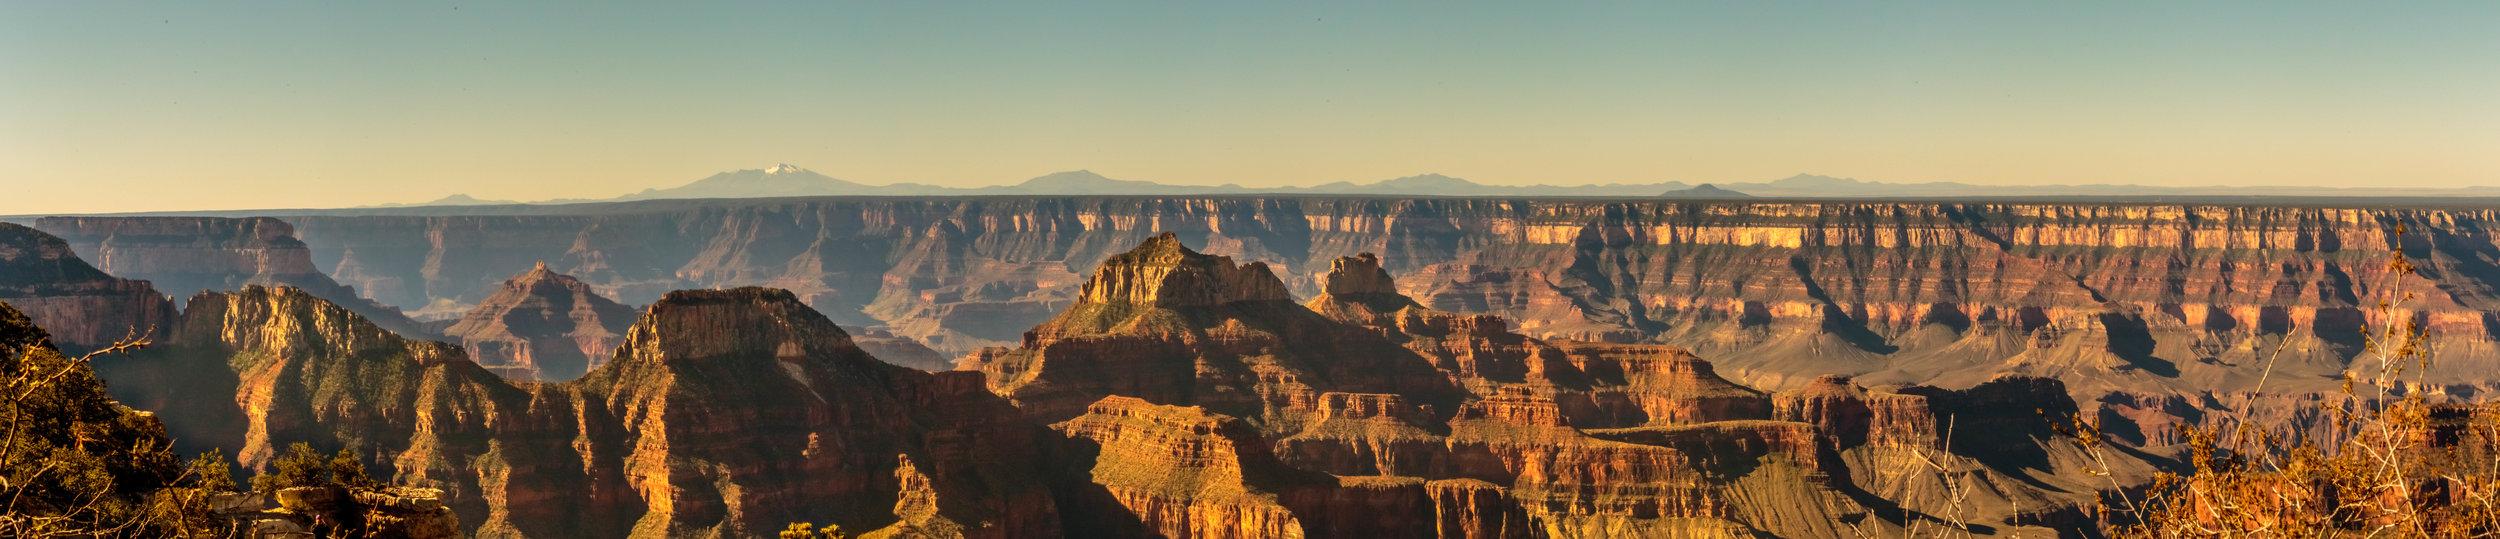 Grand Canyon National Park-North Rim, Arizona